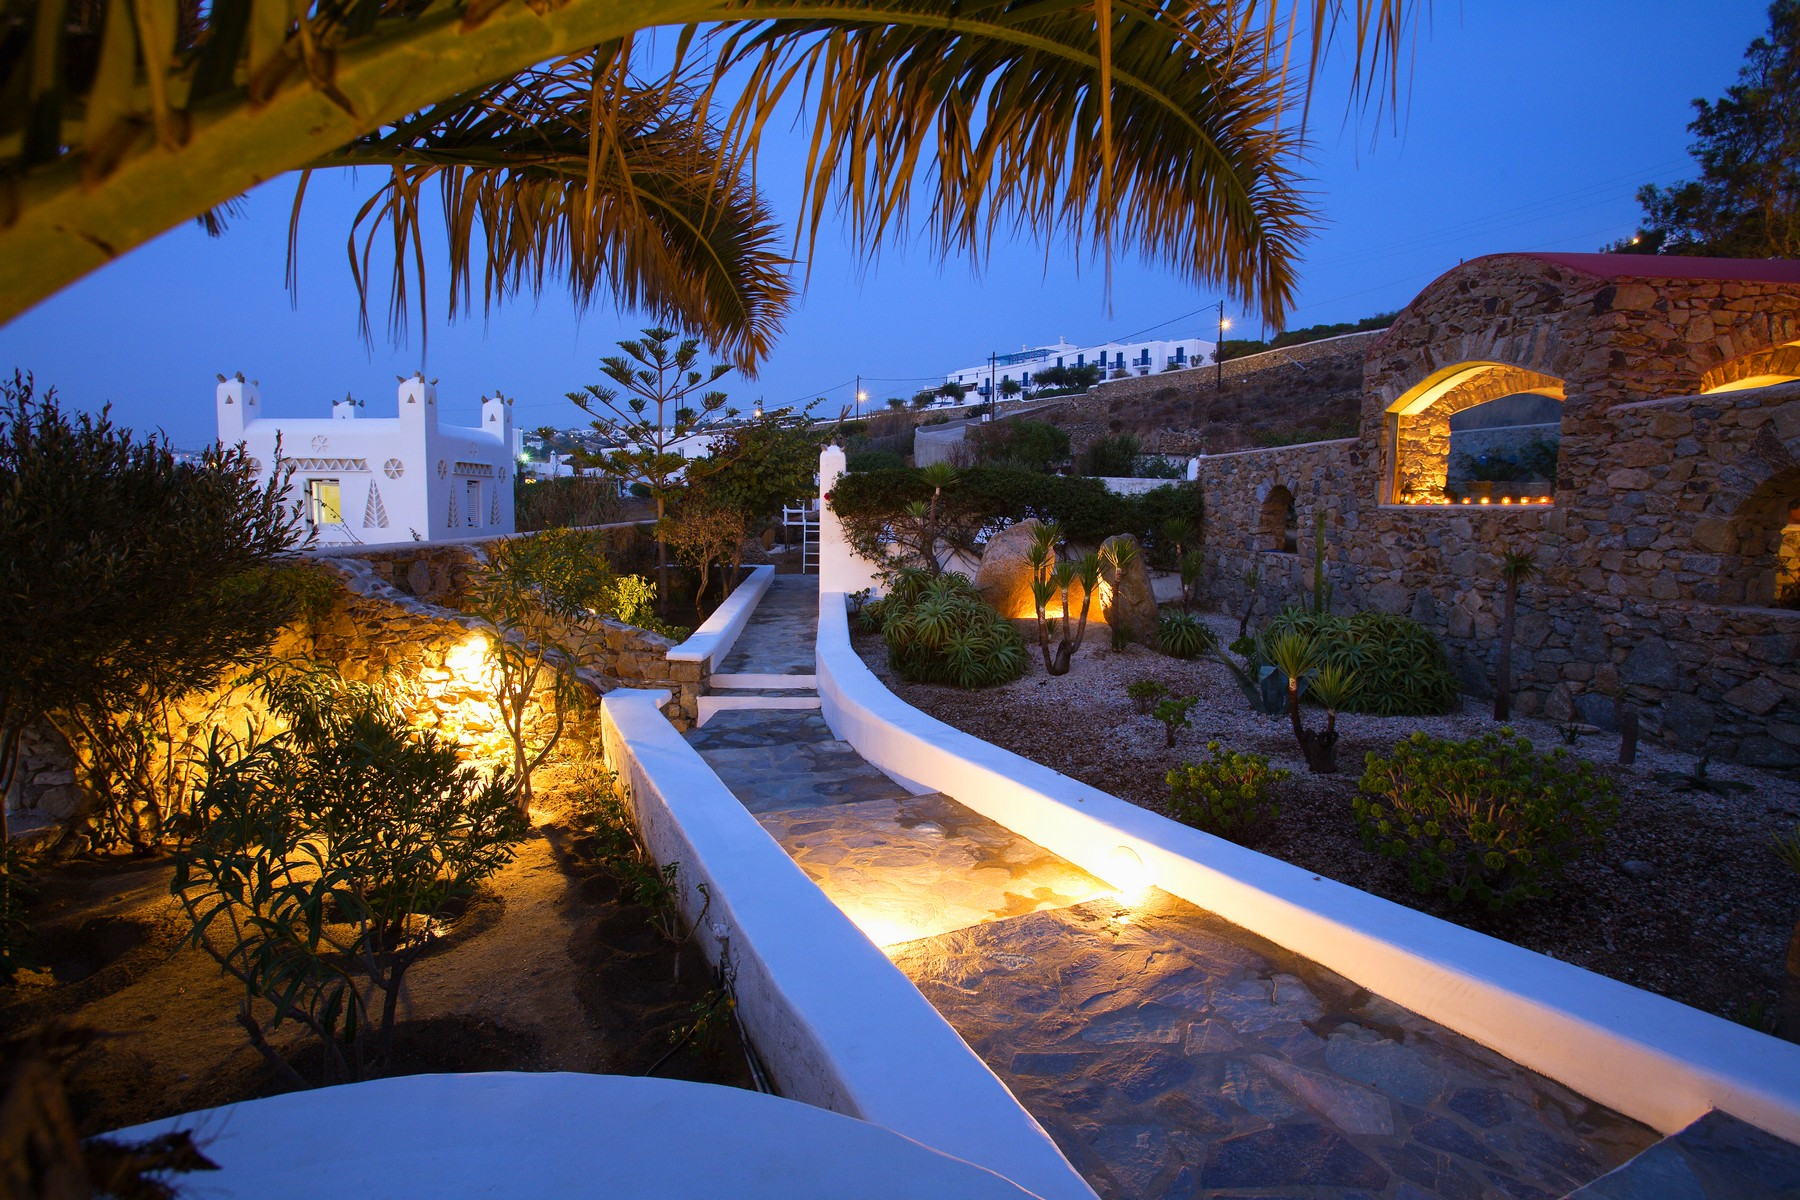 Single Family Home for Sale at Indigo Bay Mykonos Indigo Bay Mykonos, Southern Aegean, 84600 Greece